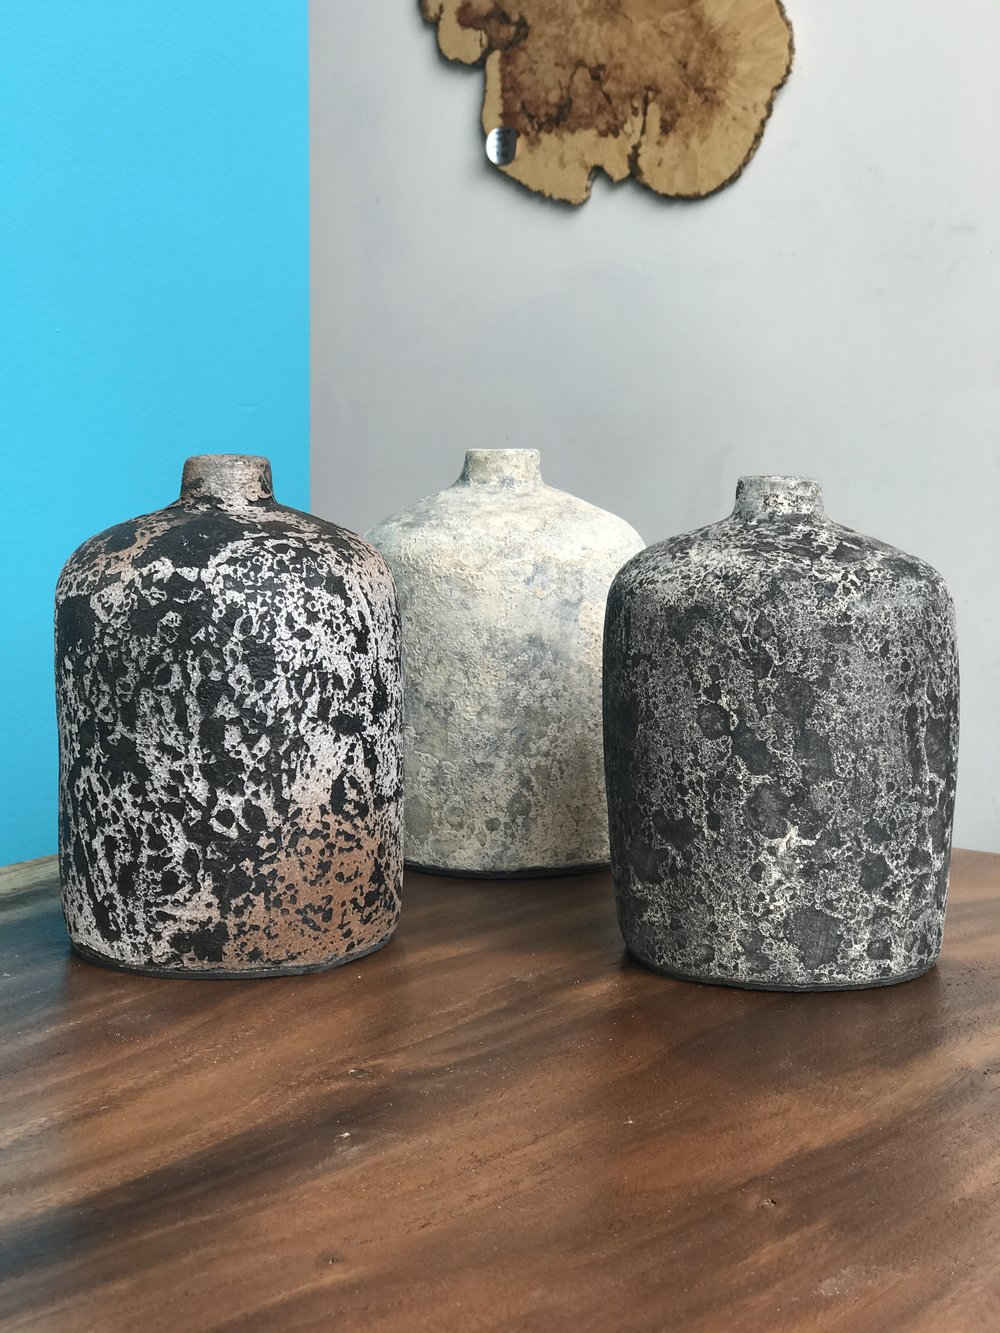 artifact pottery. blue moon furniture. artista show home furniture.jpg